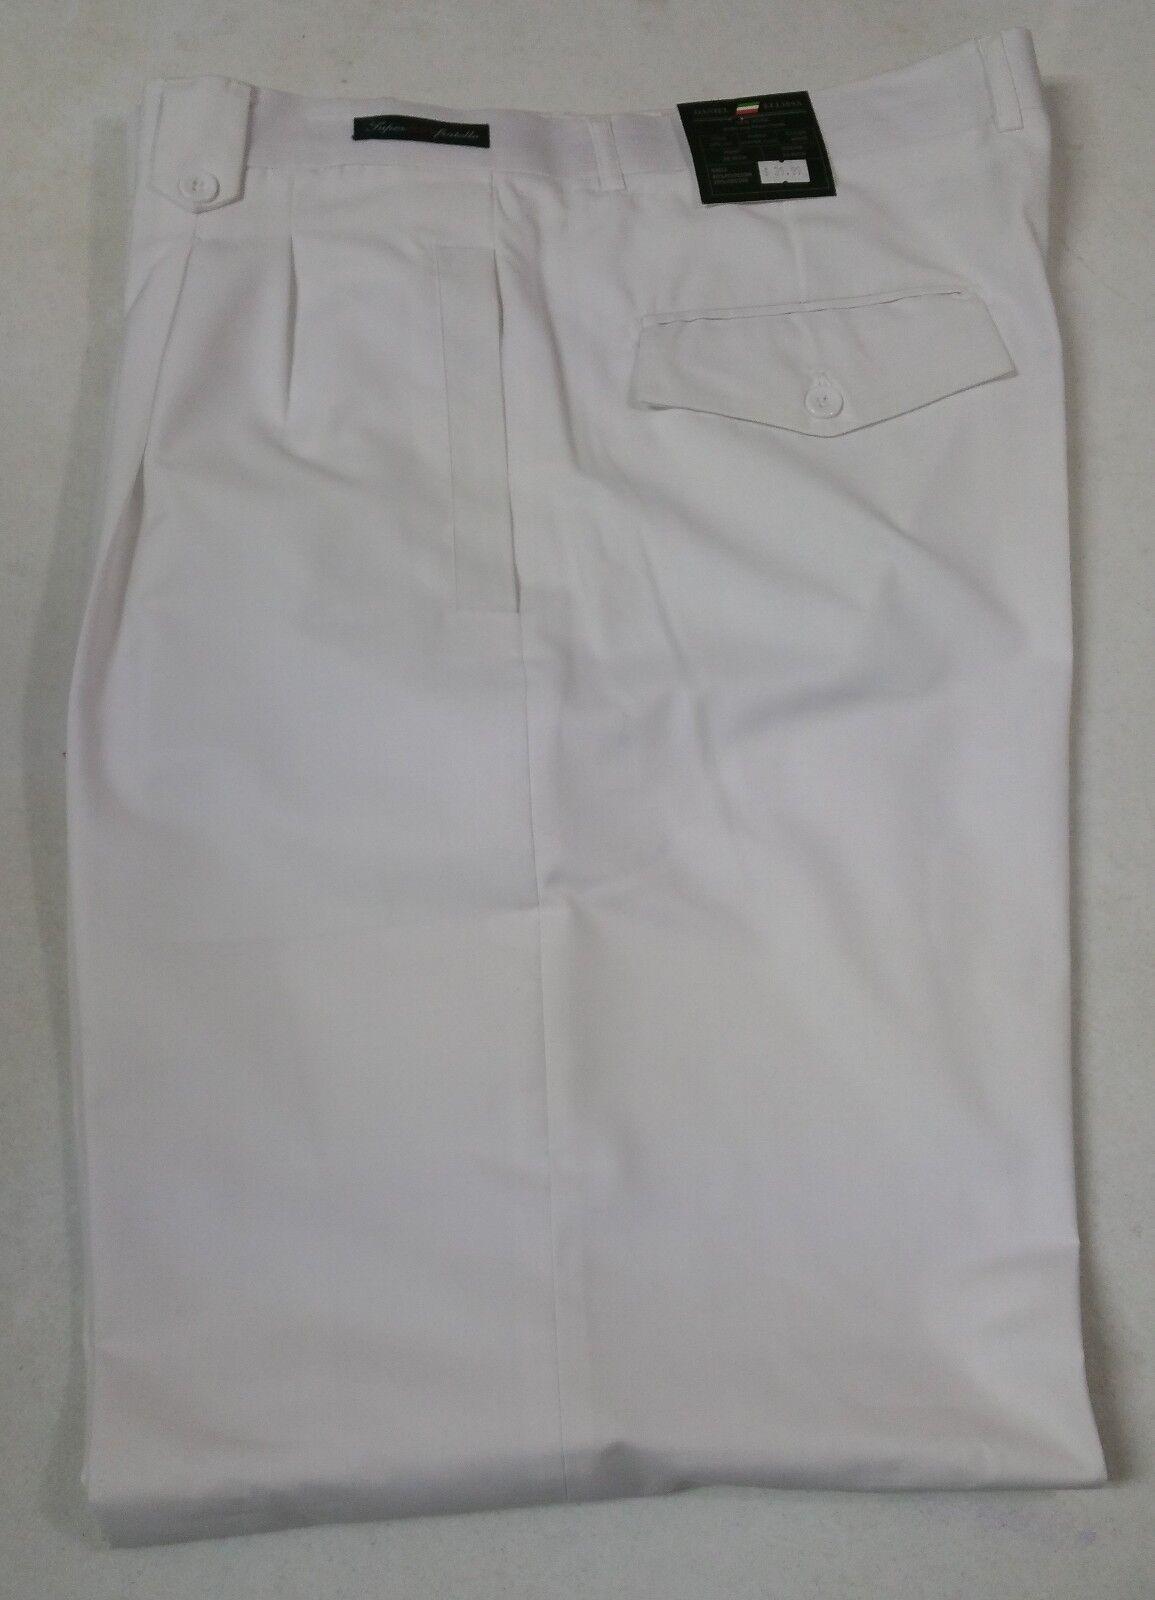 New Daniel Ellissa Men's White Wide Leg Dress Pants Style DPR 107